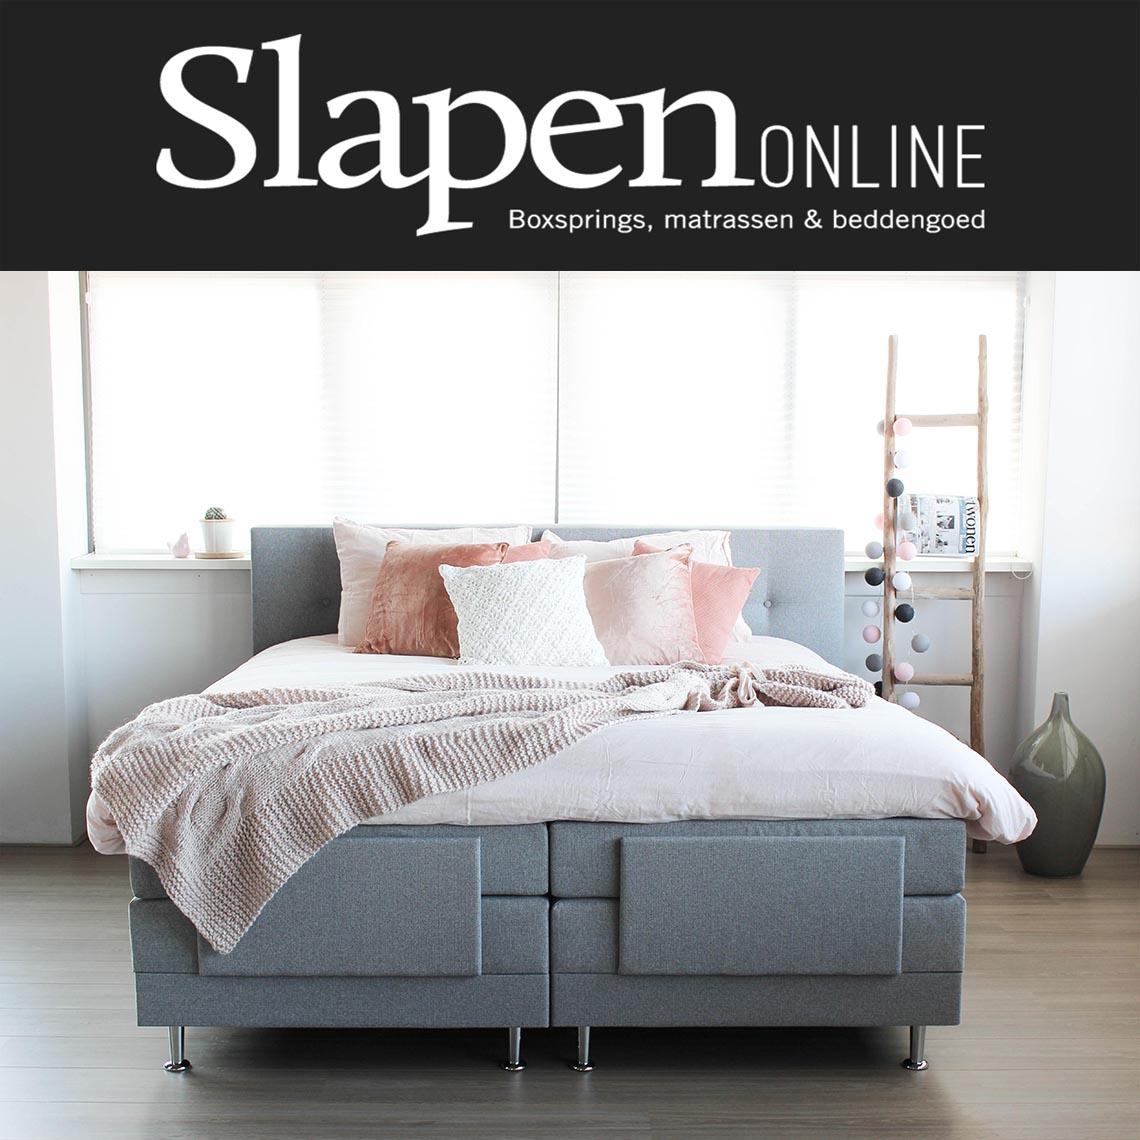 goedkope complete boxspring 160x200 slapen online. Black Bedroom Furniture Sets. Home Design Ideas